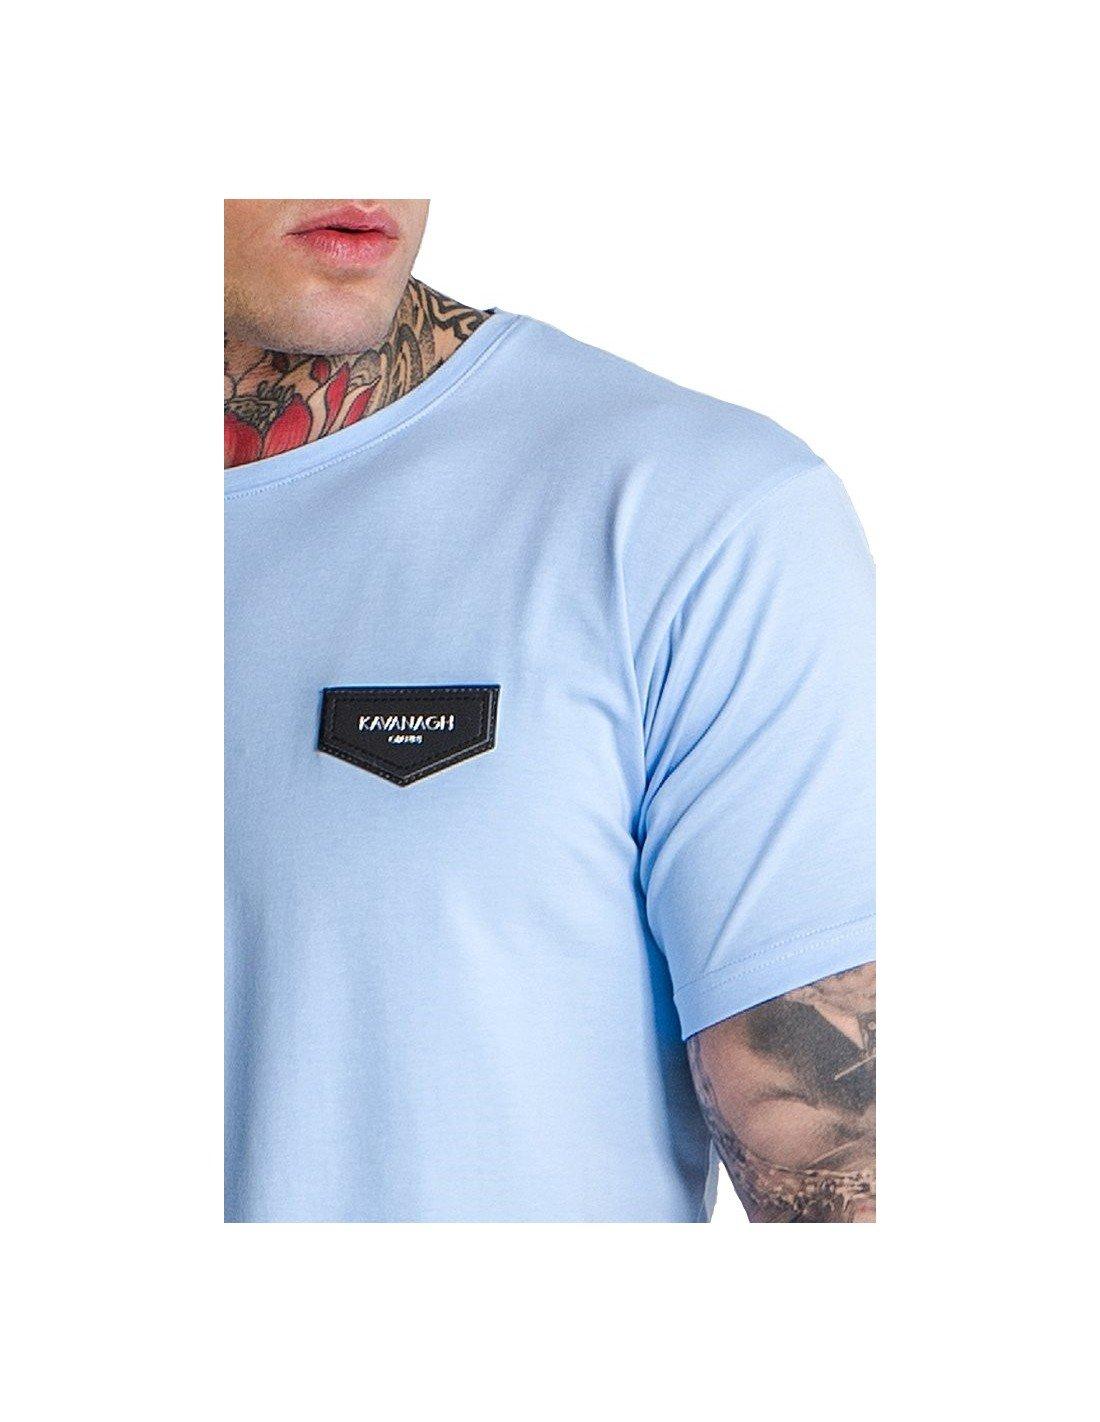 Camiseta Manga Corta Gianni Kavanagh Coleccion tee Core Celeste HEQlLFdazP